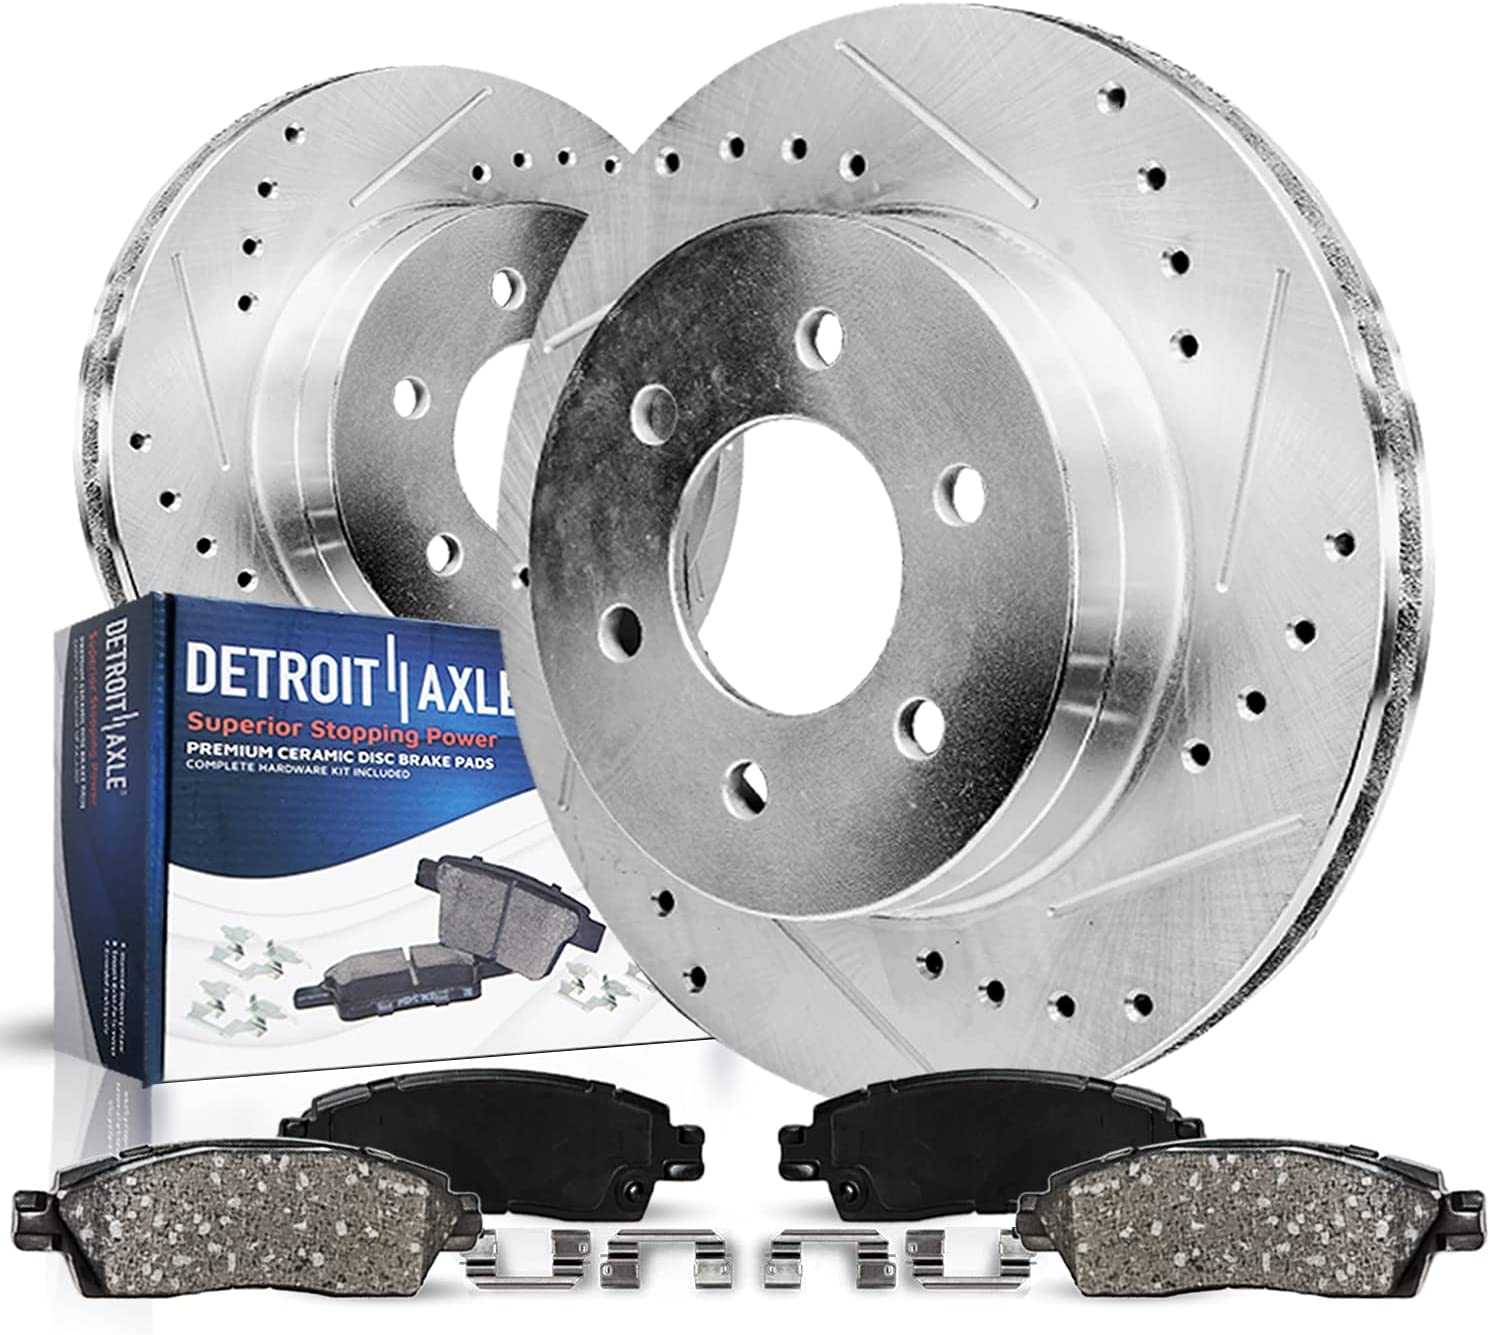 Detroit Axle - Front Drilled Slotted C 期間限定で特別価格 超目玉 Rotors Kit Disc Brake